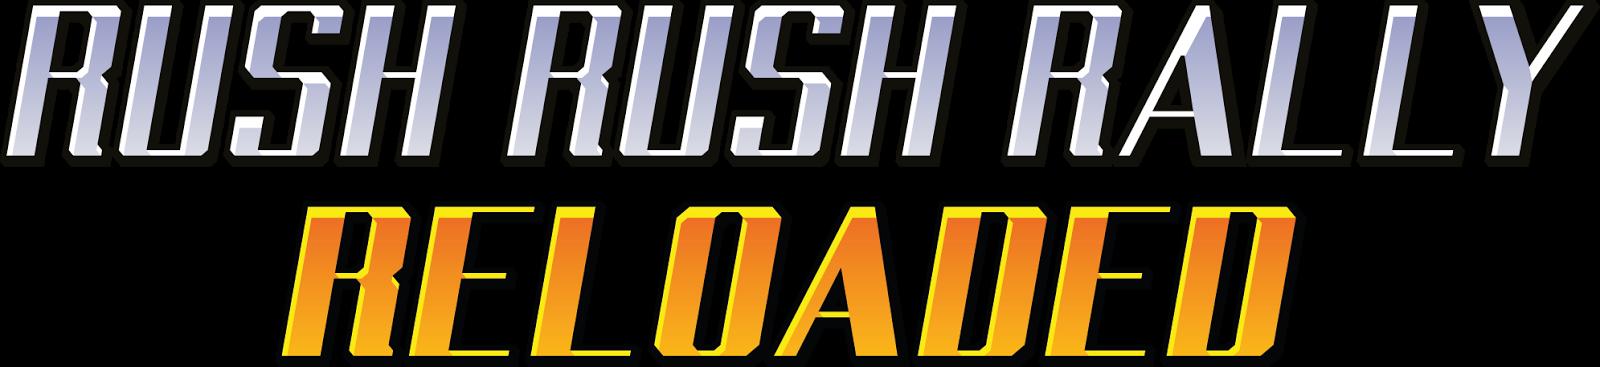 Rush Rush Rally Reloaded logo